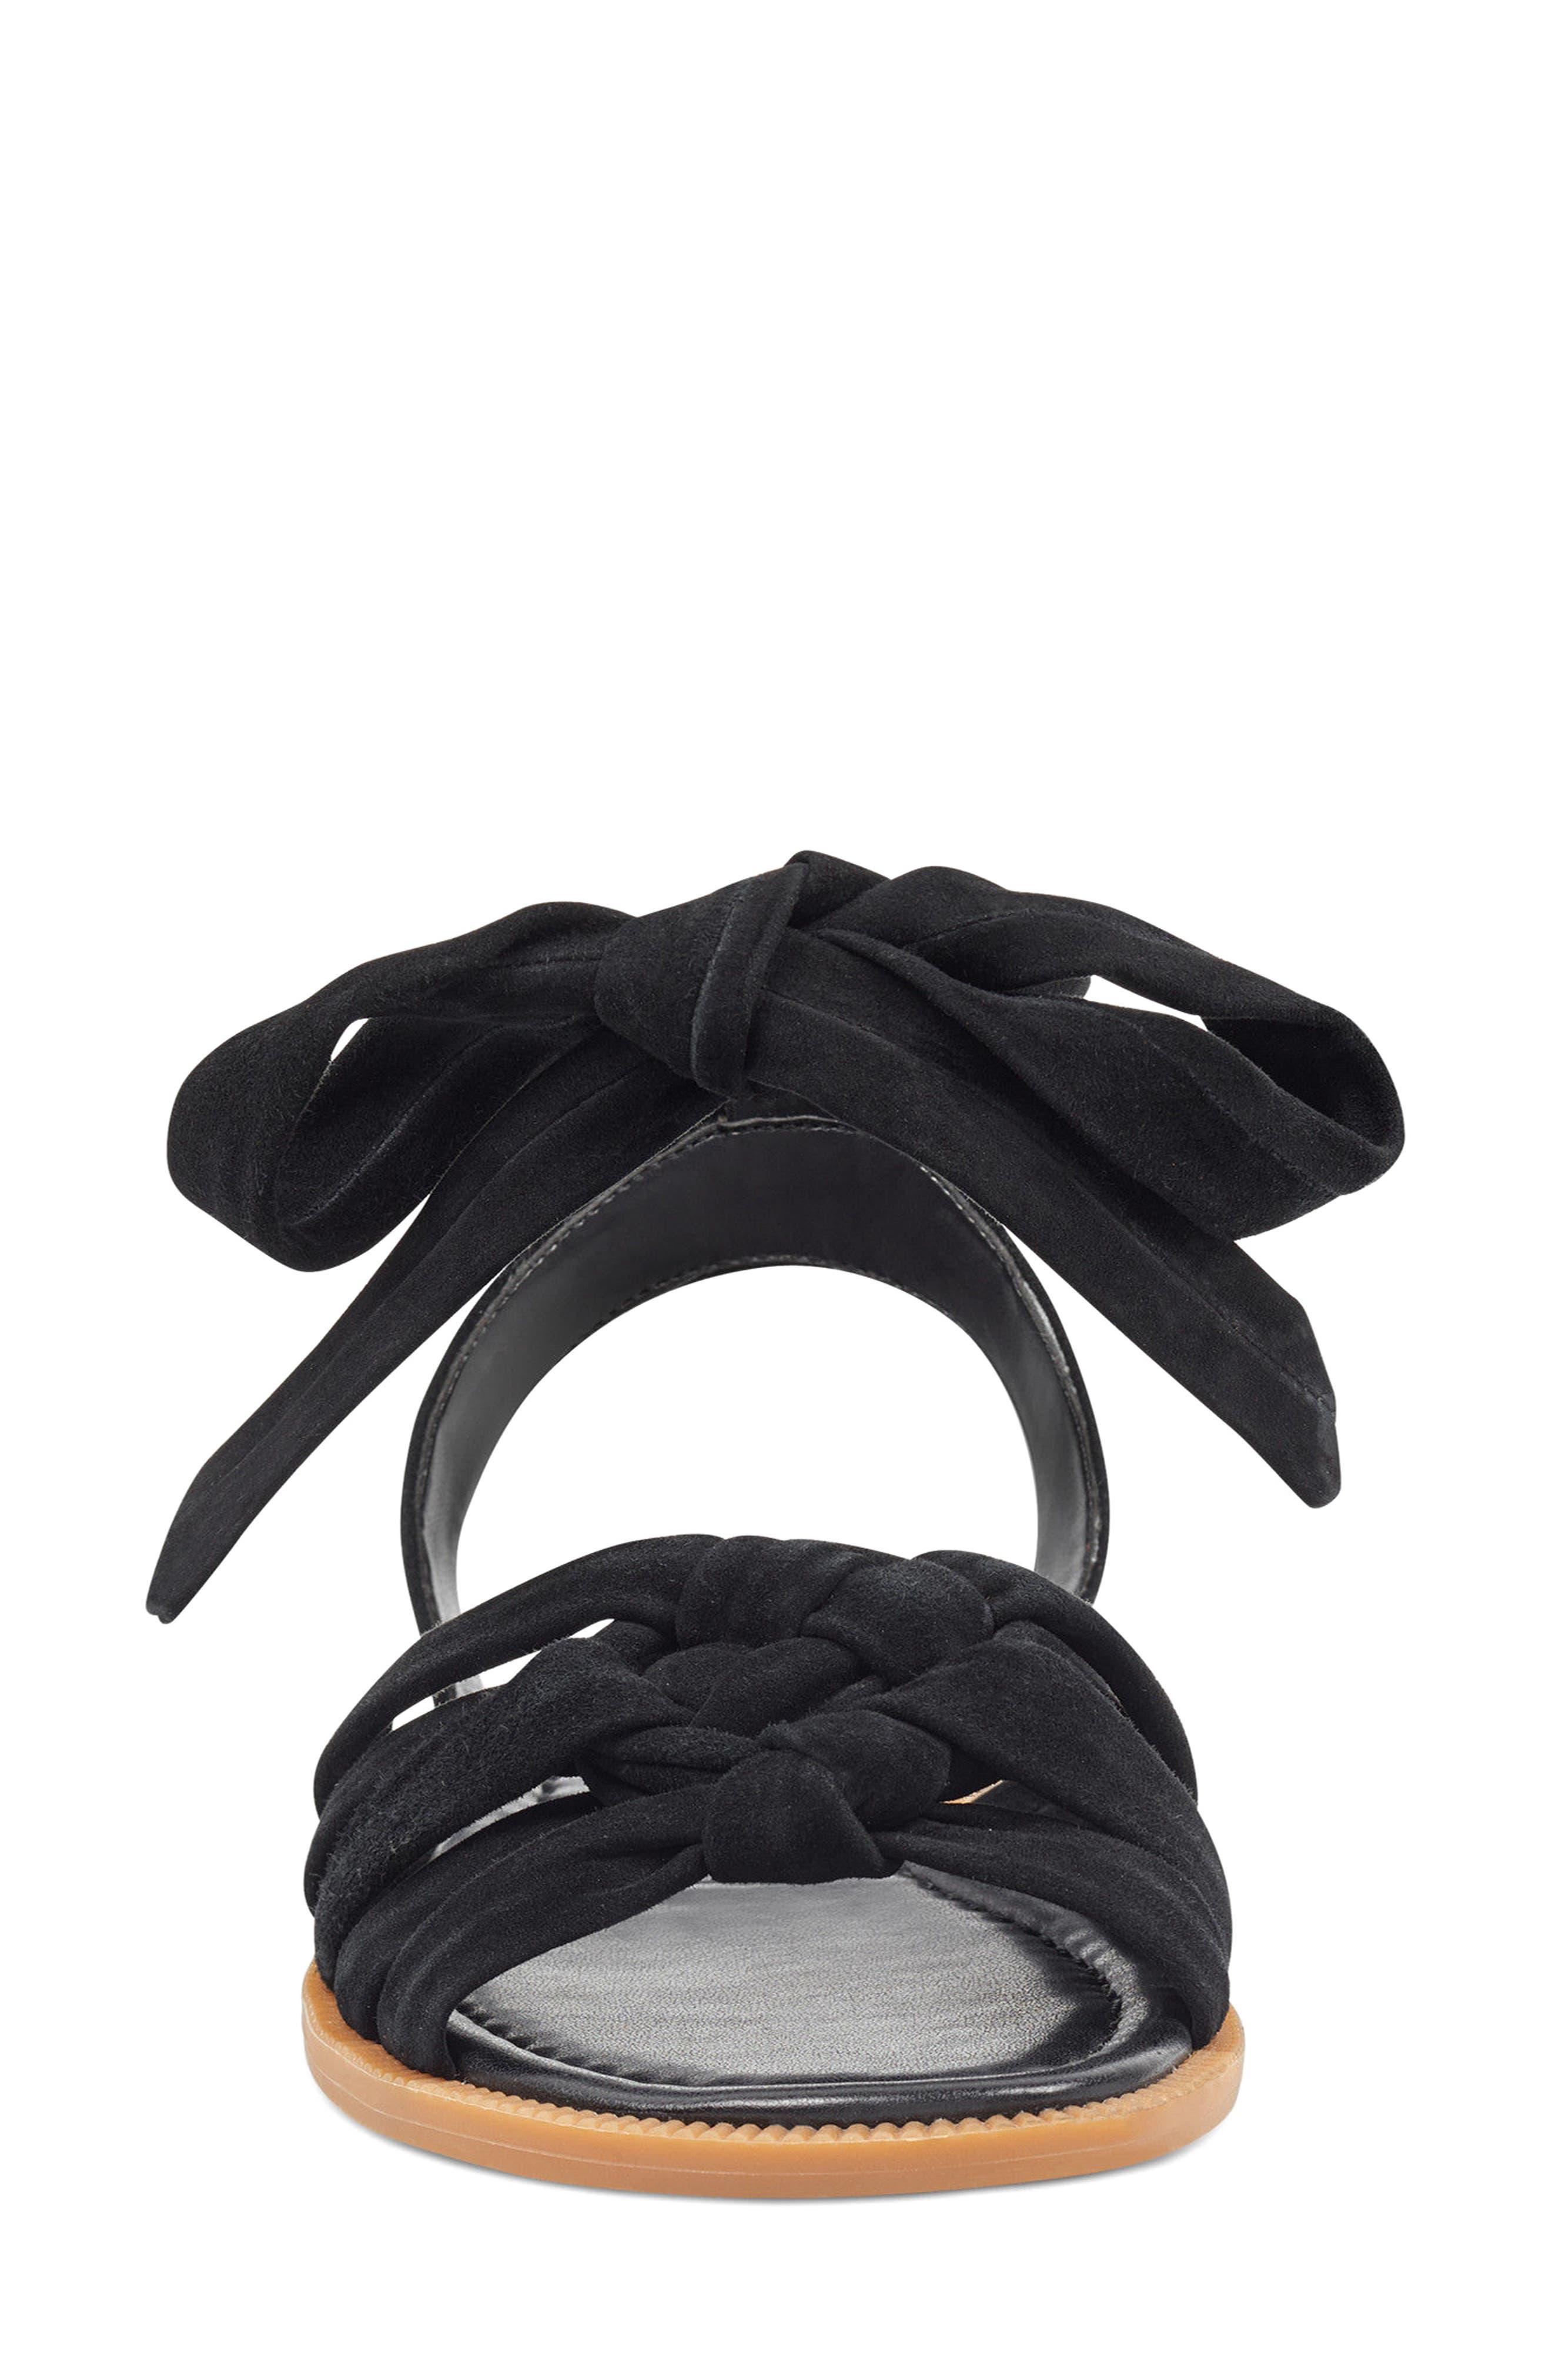 Xameera Knotted Sandal,                             Alternate thumbnail 4, color,                             002